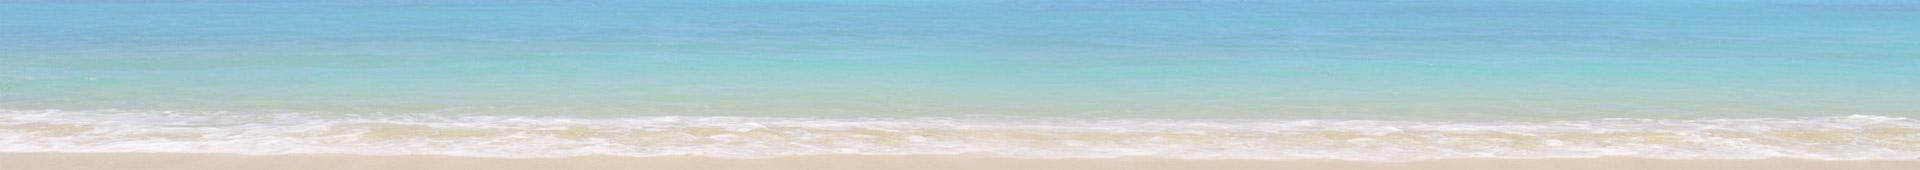 Aristi Studio Apartments and Rooms at Myrina of Lemnos Island Greece - Αρίστη Ενοικιαζόμενα Διαμερίσματα και Δωμάτια στη Μύρινα, Λήμνος